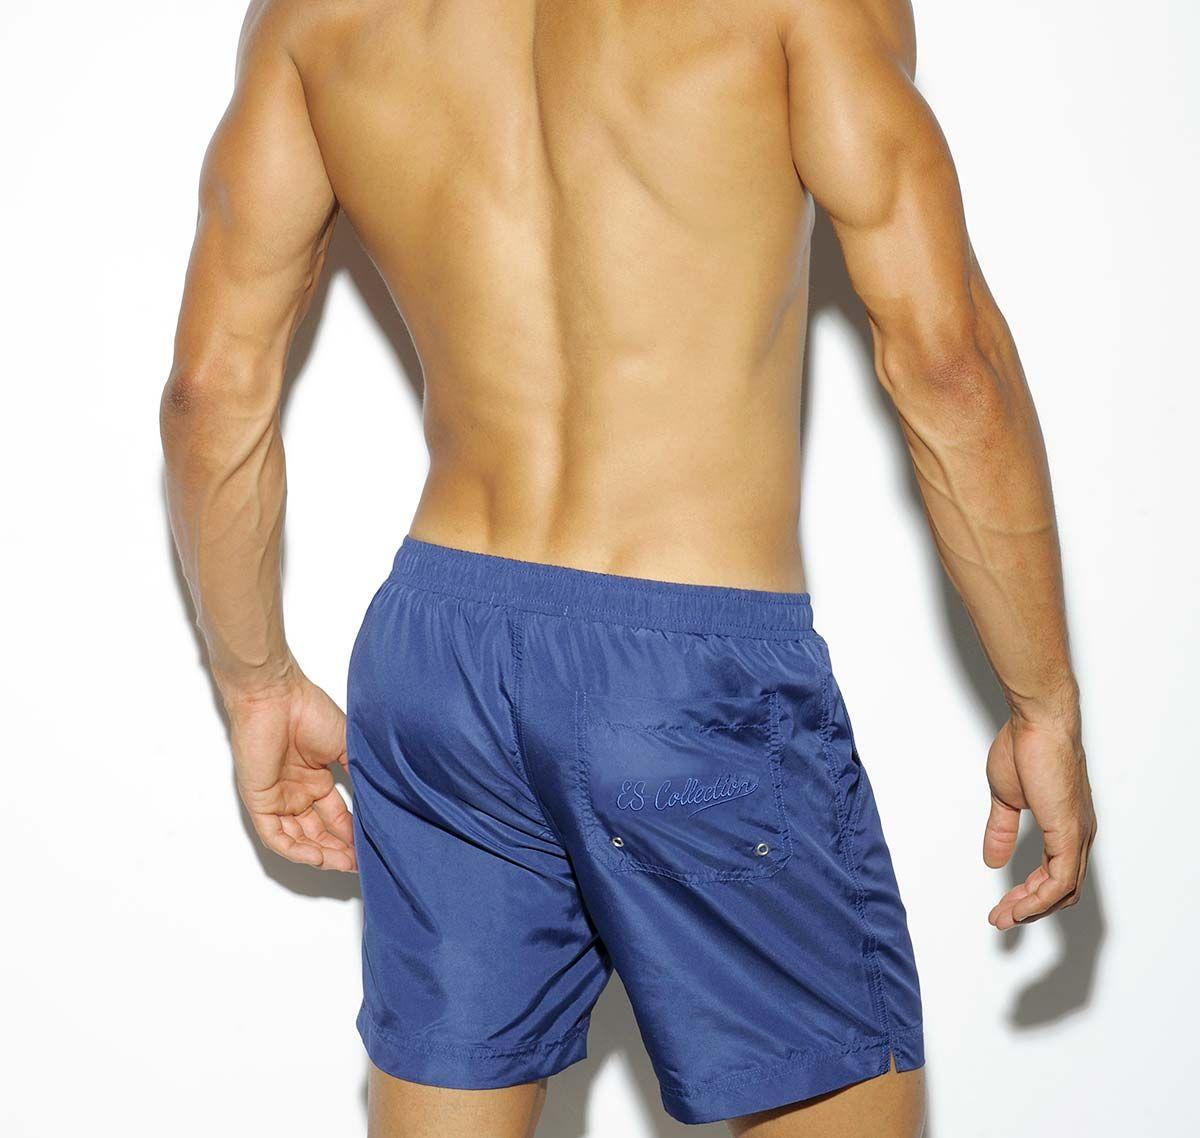 ES Collection Badeshorts BASIC SWIM SHORT 1721, navy blau